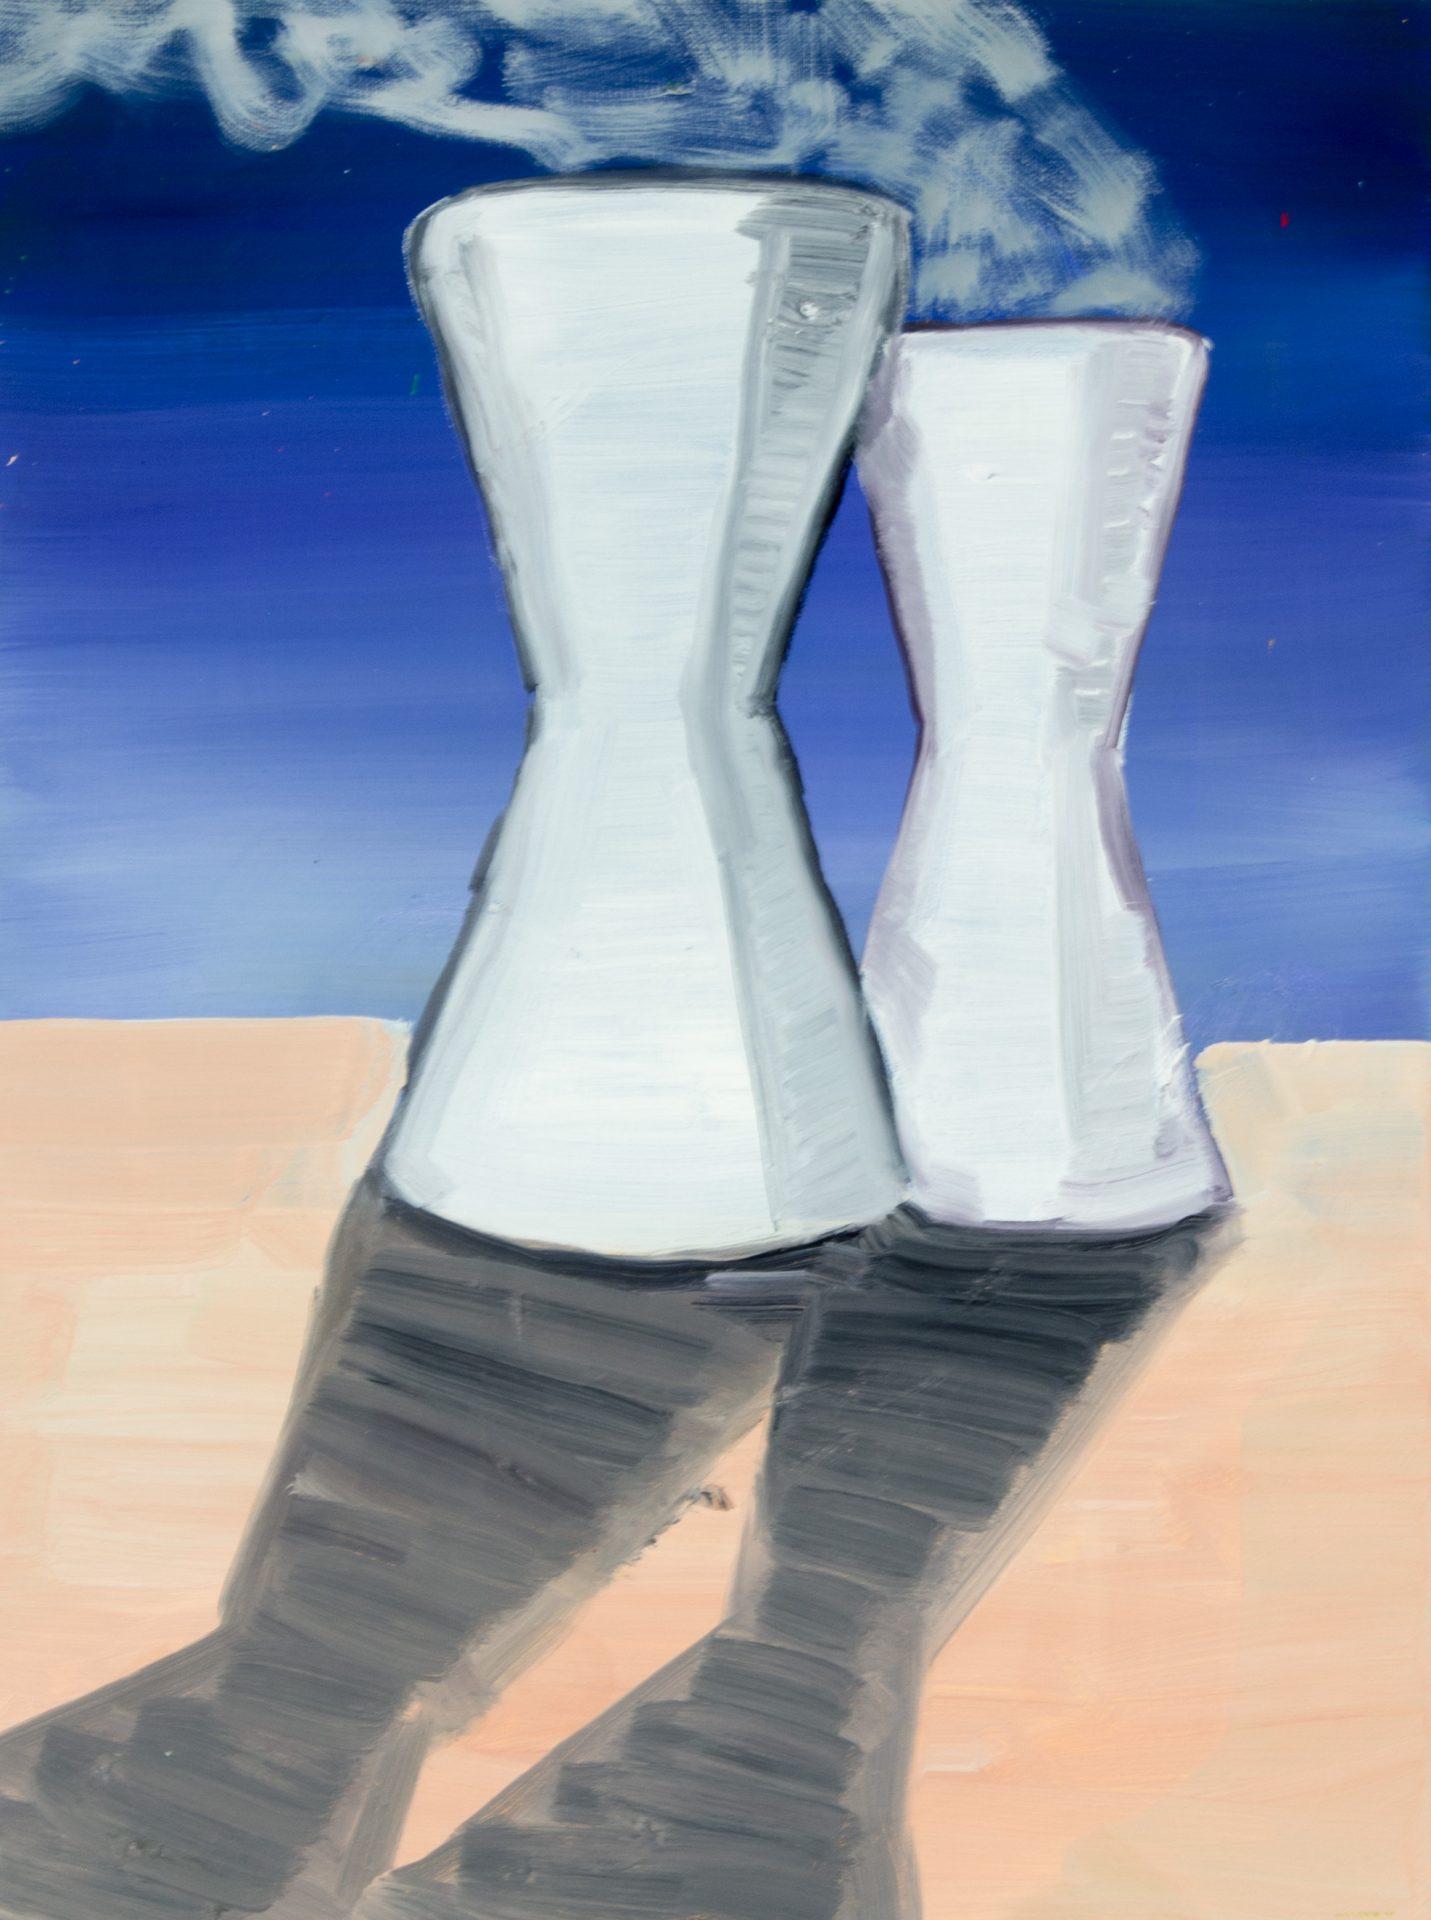 黃海欣 Huang HaiHsin, 無題 Untitled, 2020, 畫布油彩 oil on canvas, 40 x 30 cm-7